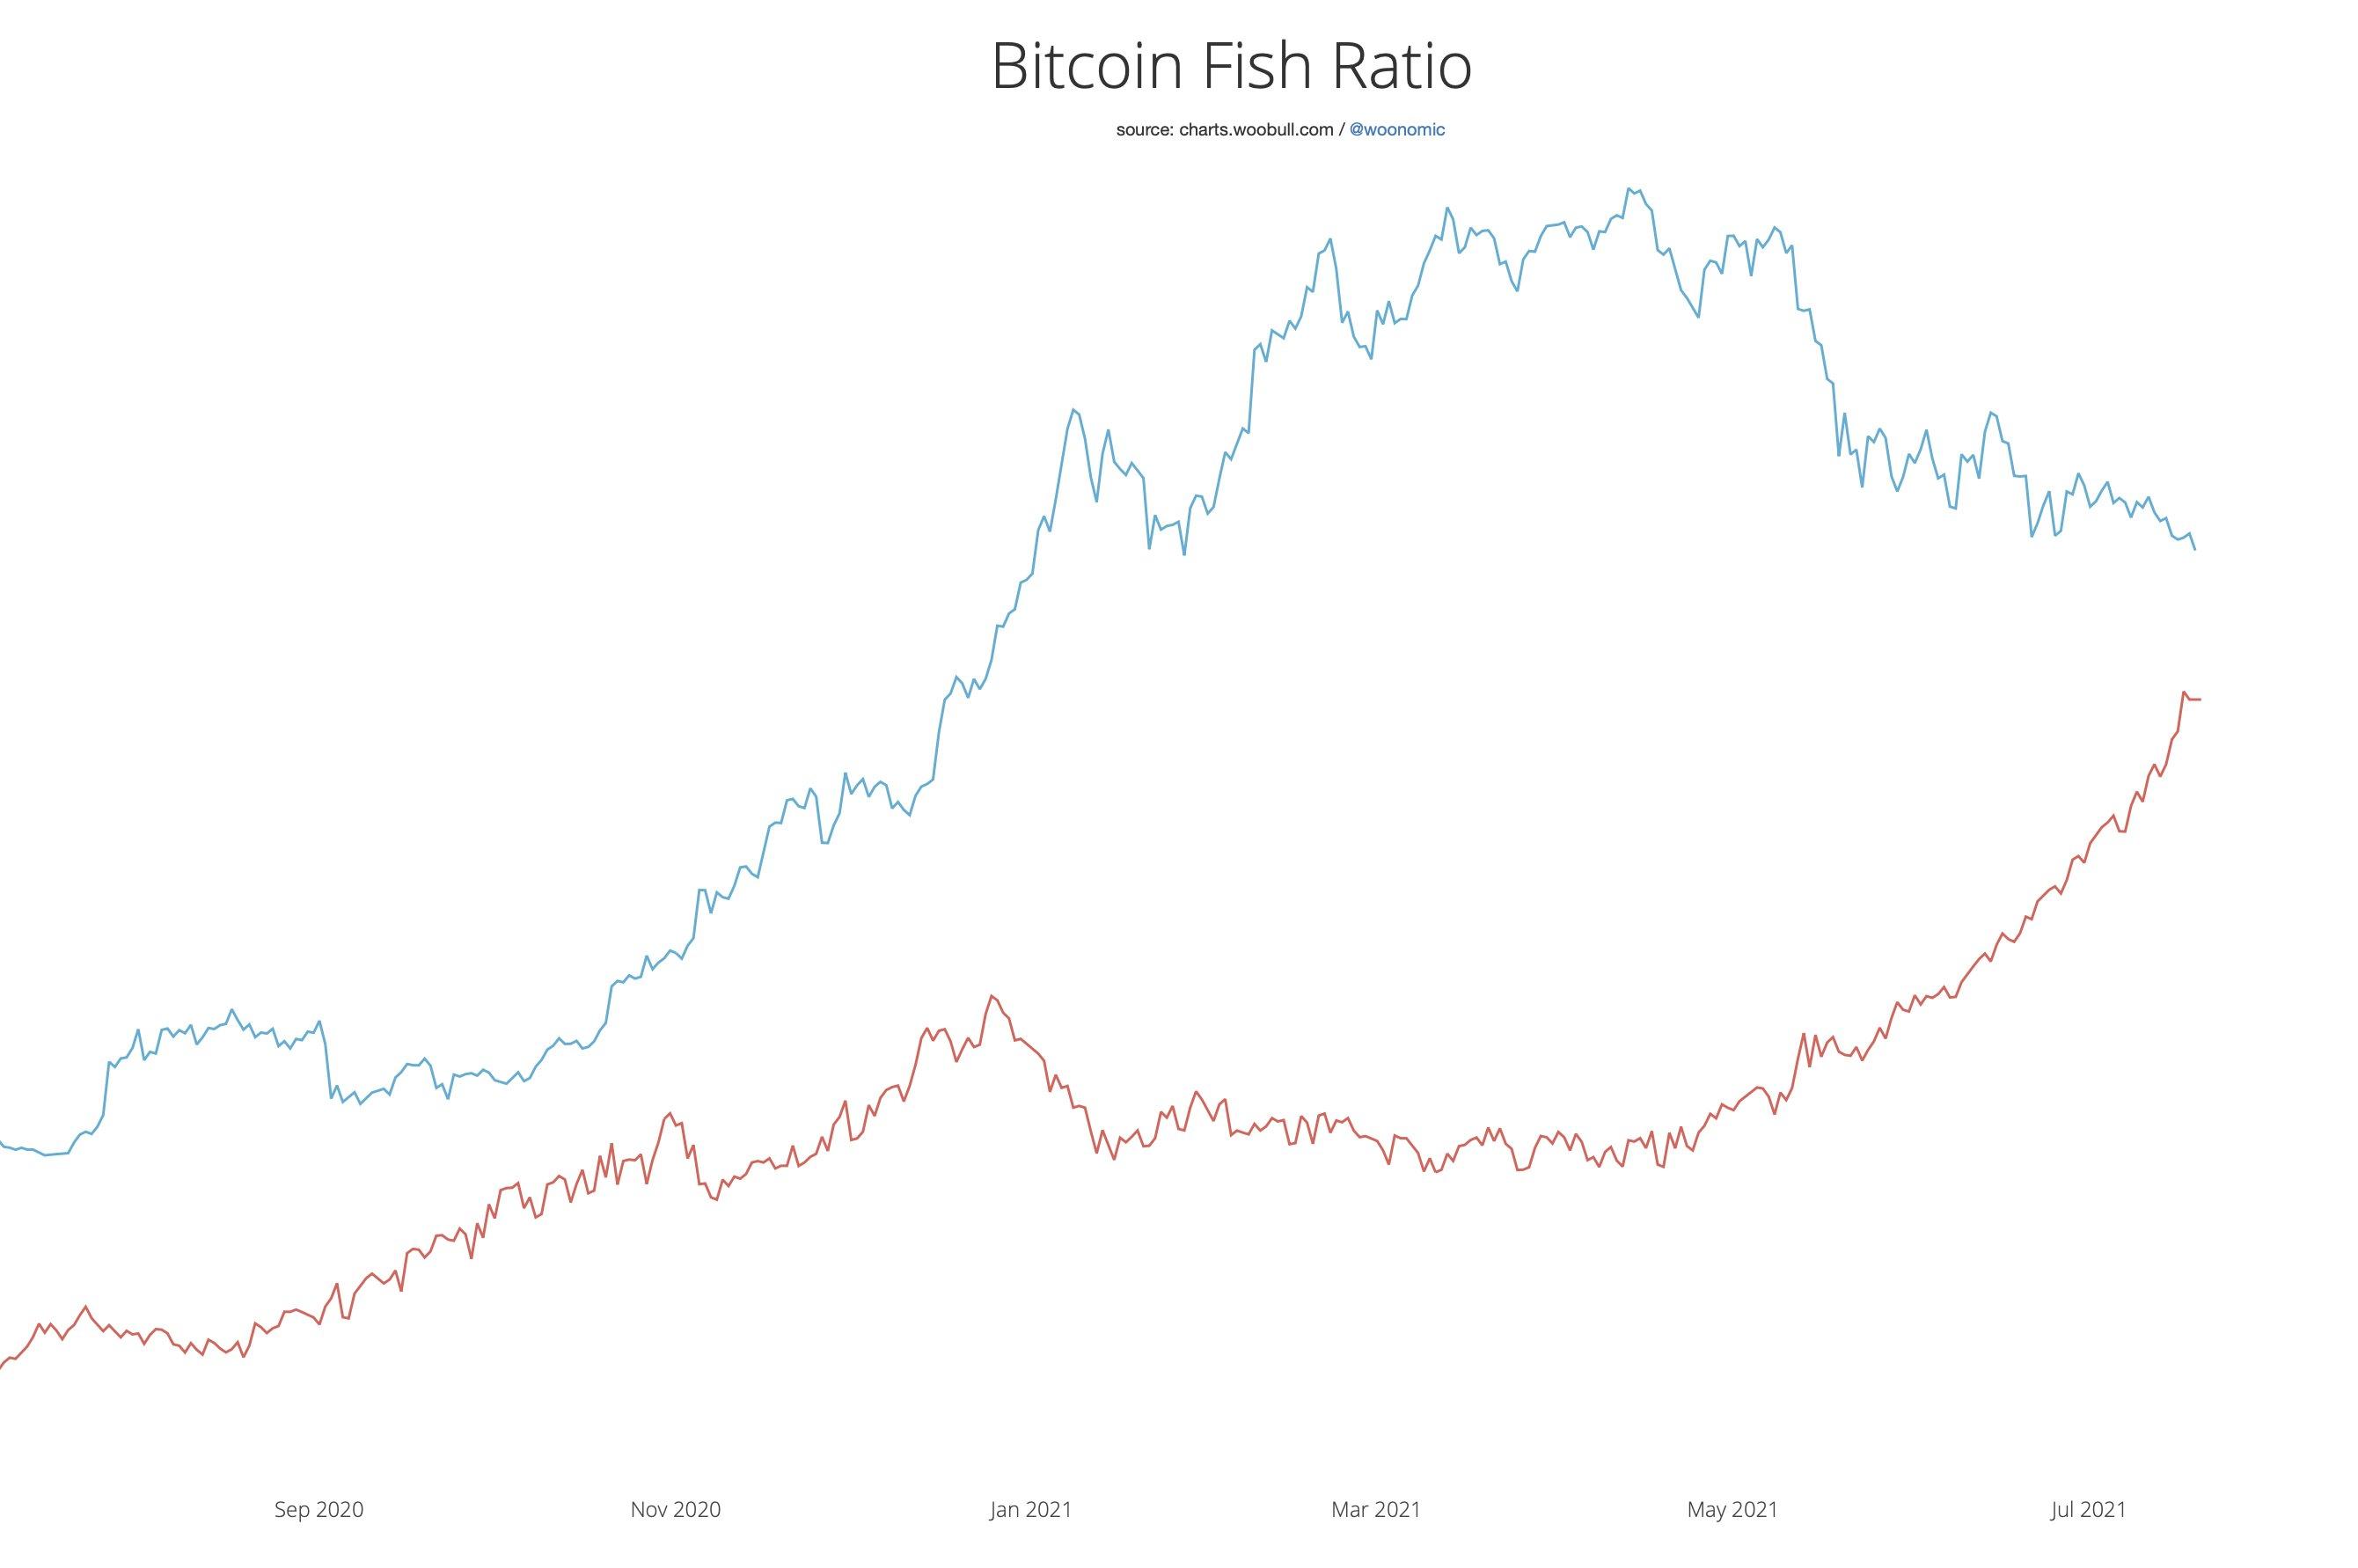 3 Bitcoin Fish Ratio Woo